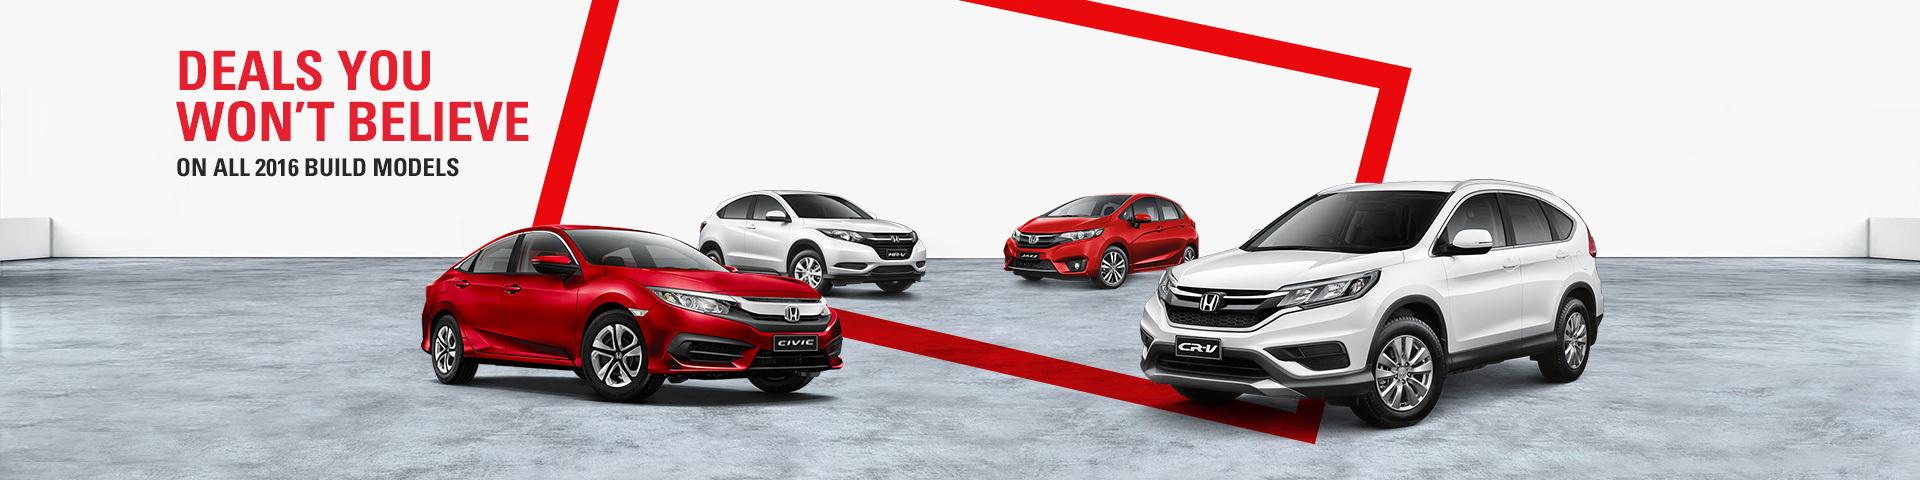 Honda - National offer - Deals You Won't Believe On All 2016 Build Models